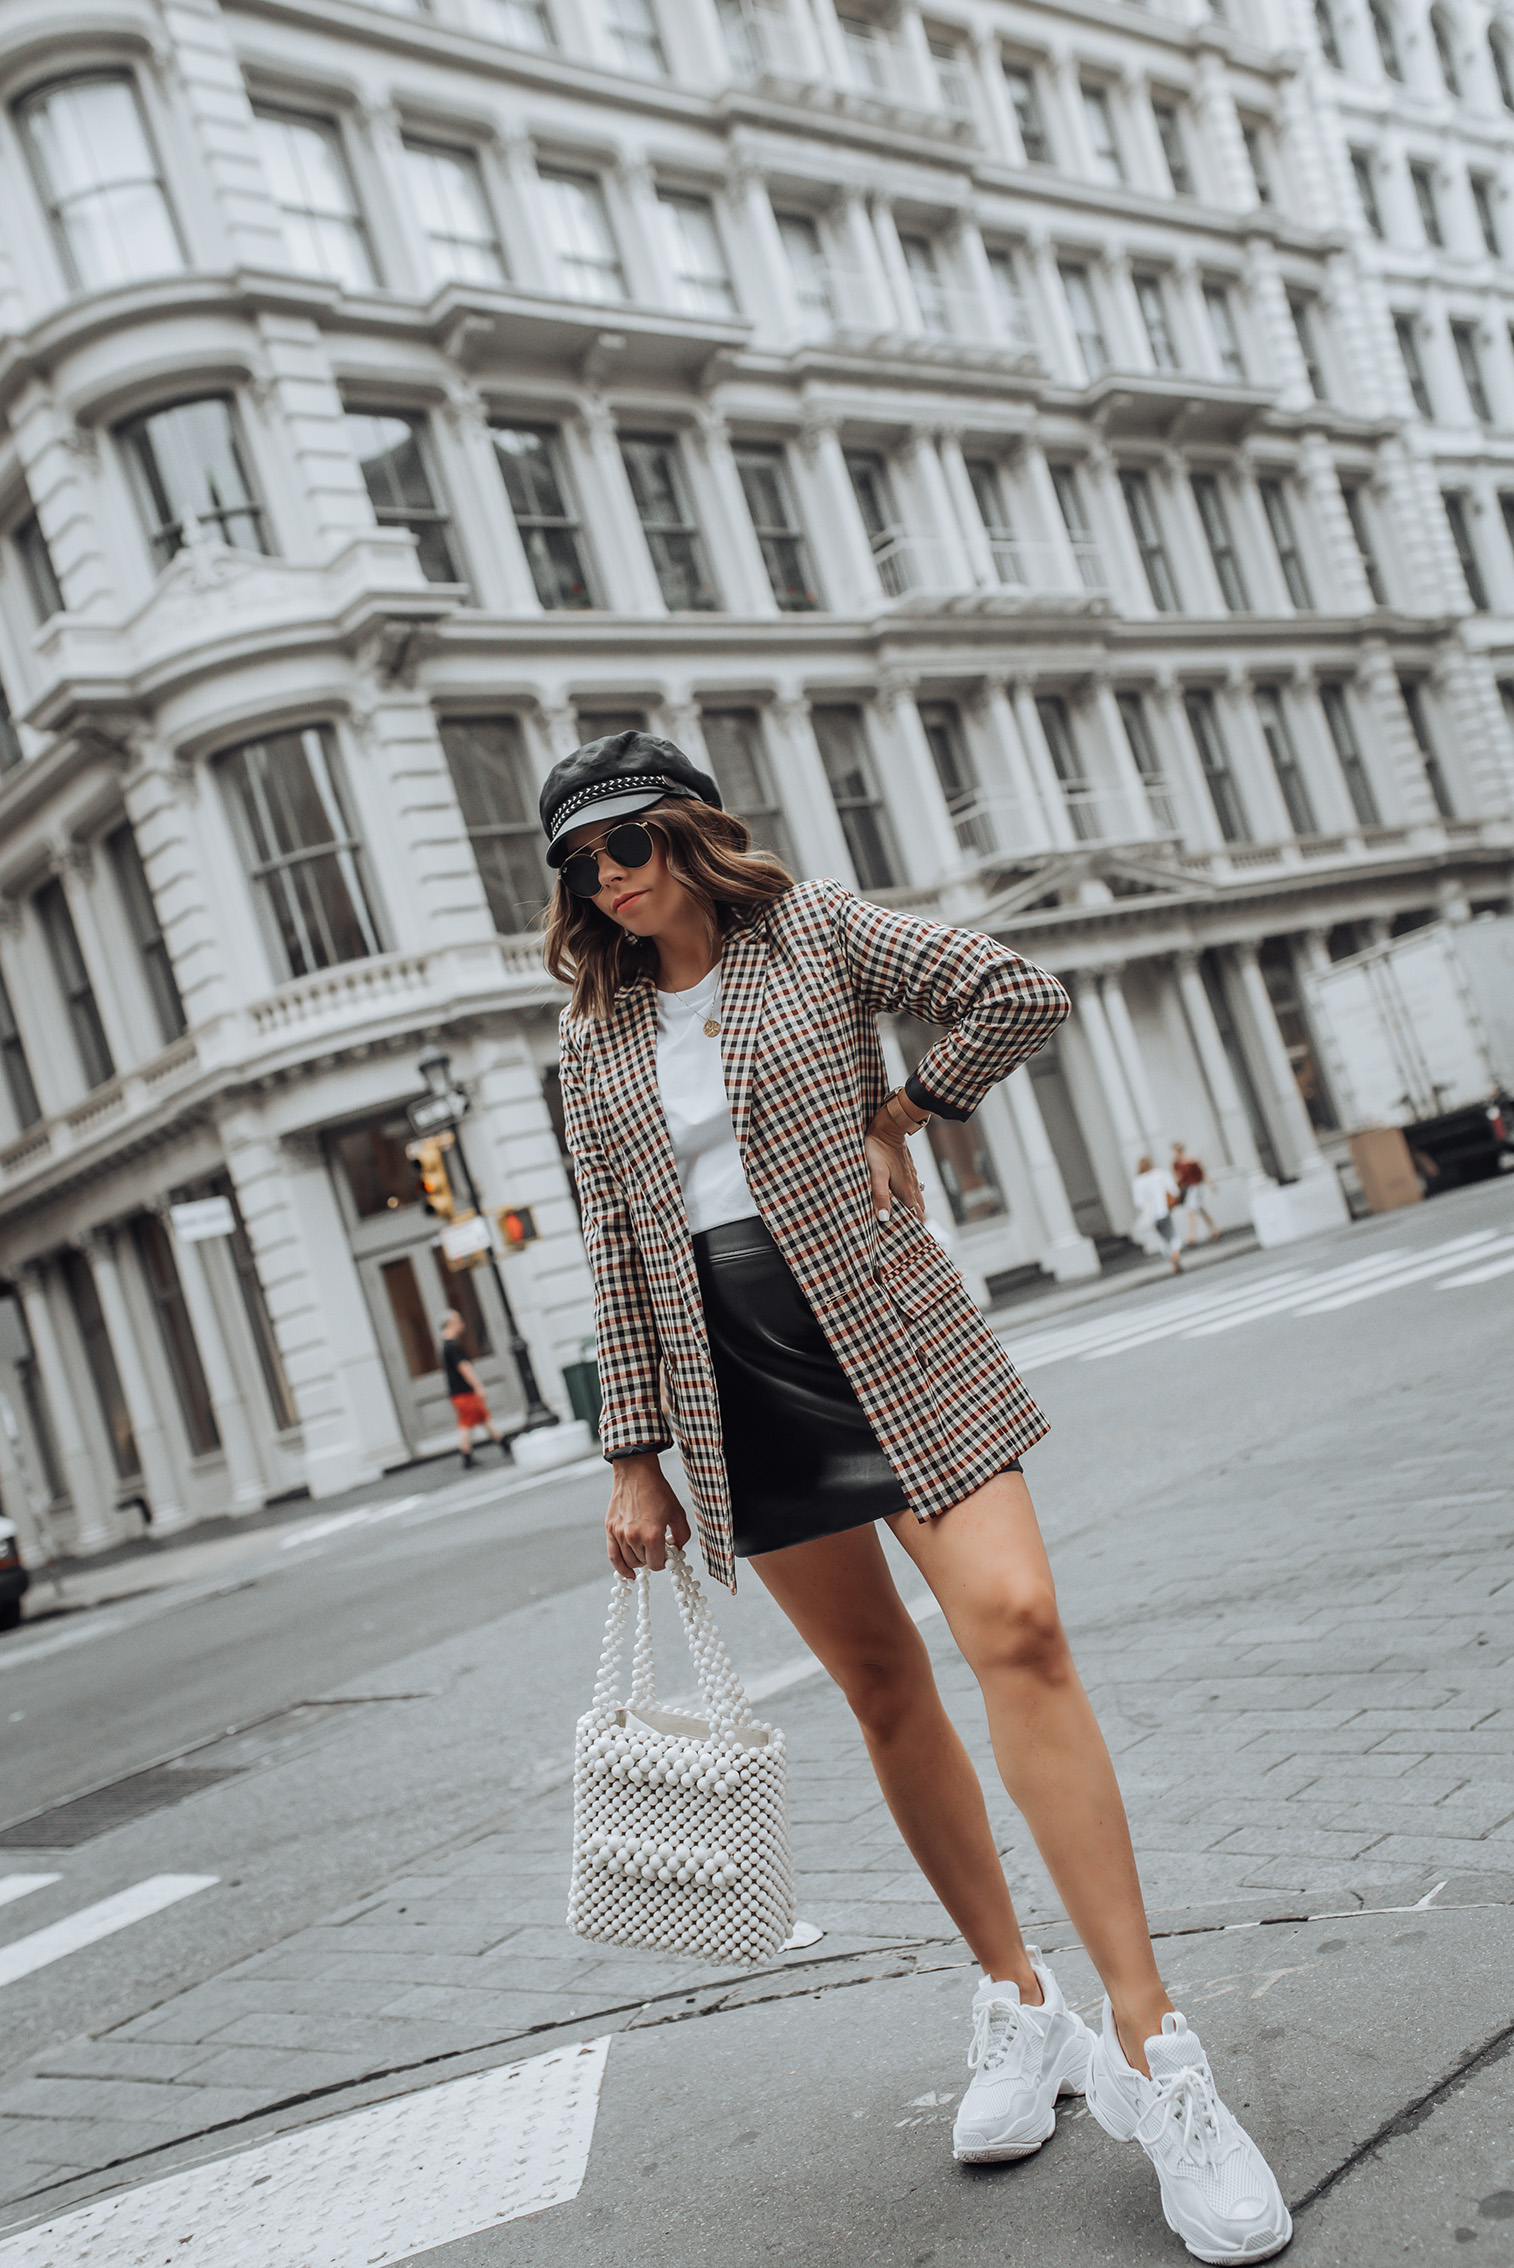 NYFW Check print  Check Blazer   H&M Skirt   Beaded Handbag   Lo Fi Sneaker #streetstyle #ootd #asos #checkprint